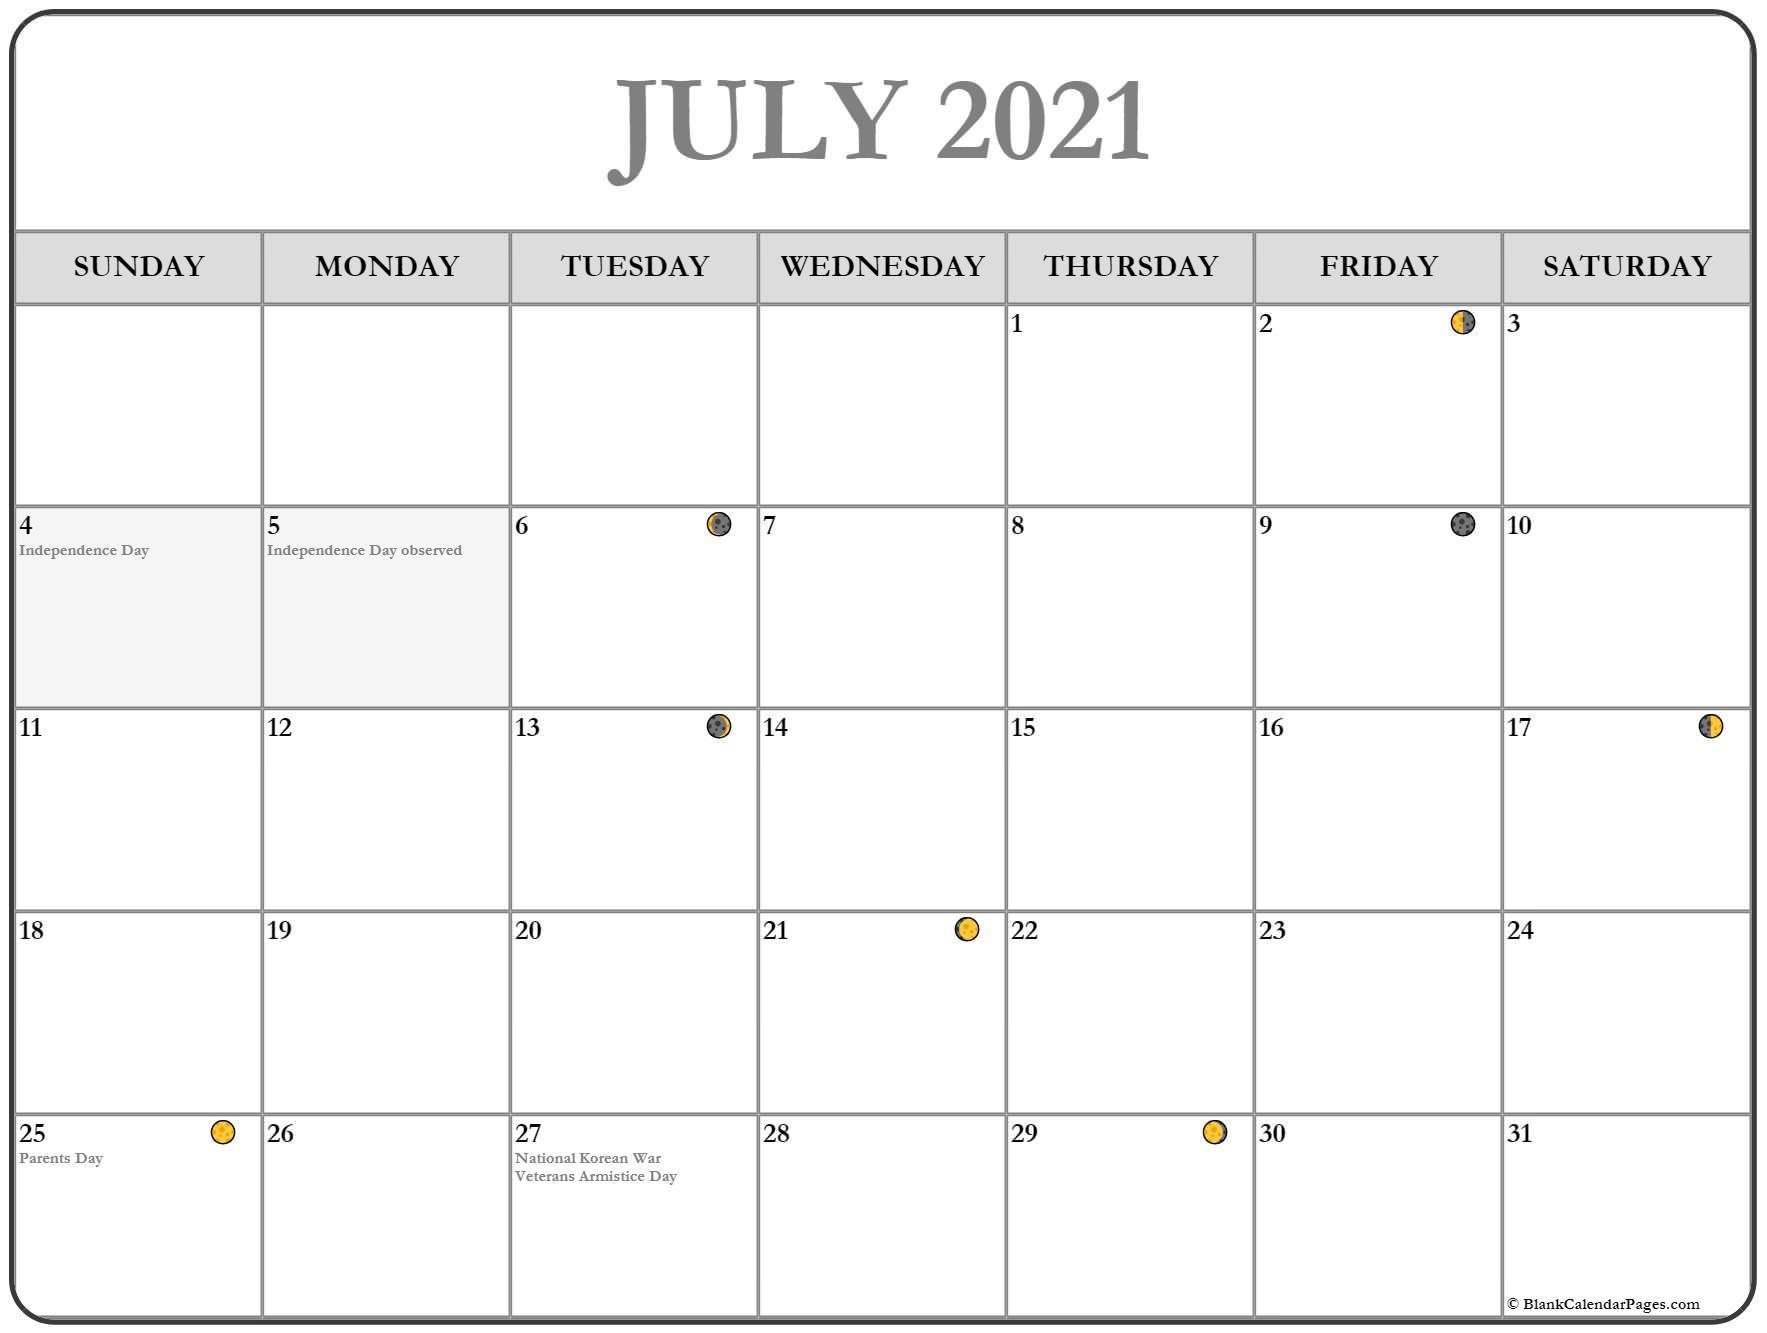 July 2021 Lunar Calendar | Moon Phase Calendar Regarding Moon Phase Deer Hunting Chart 2021